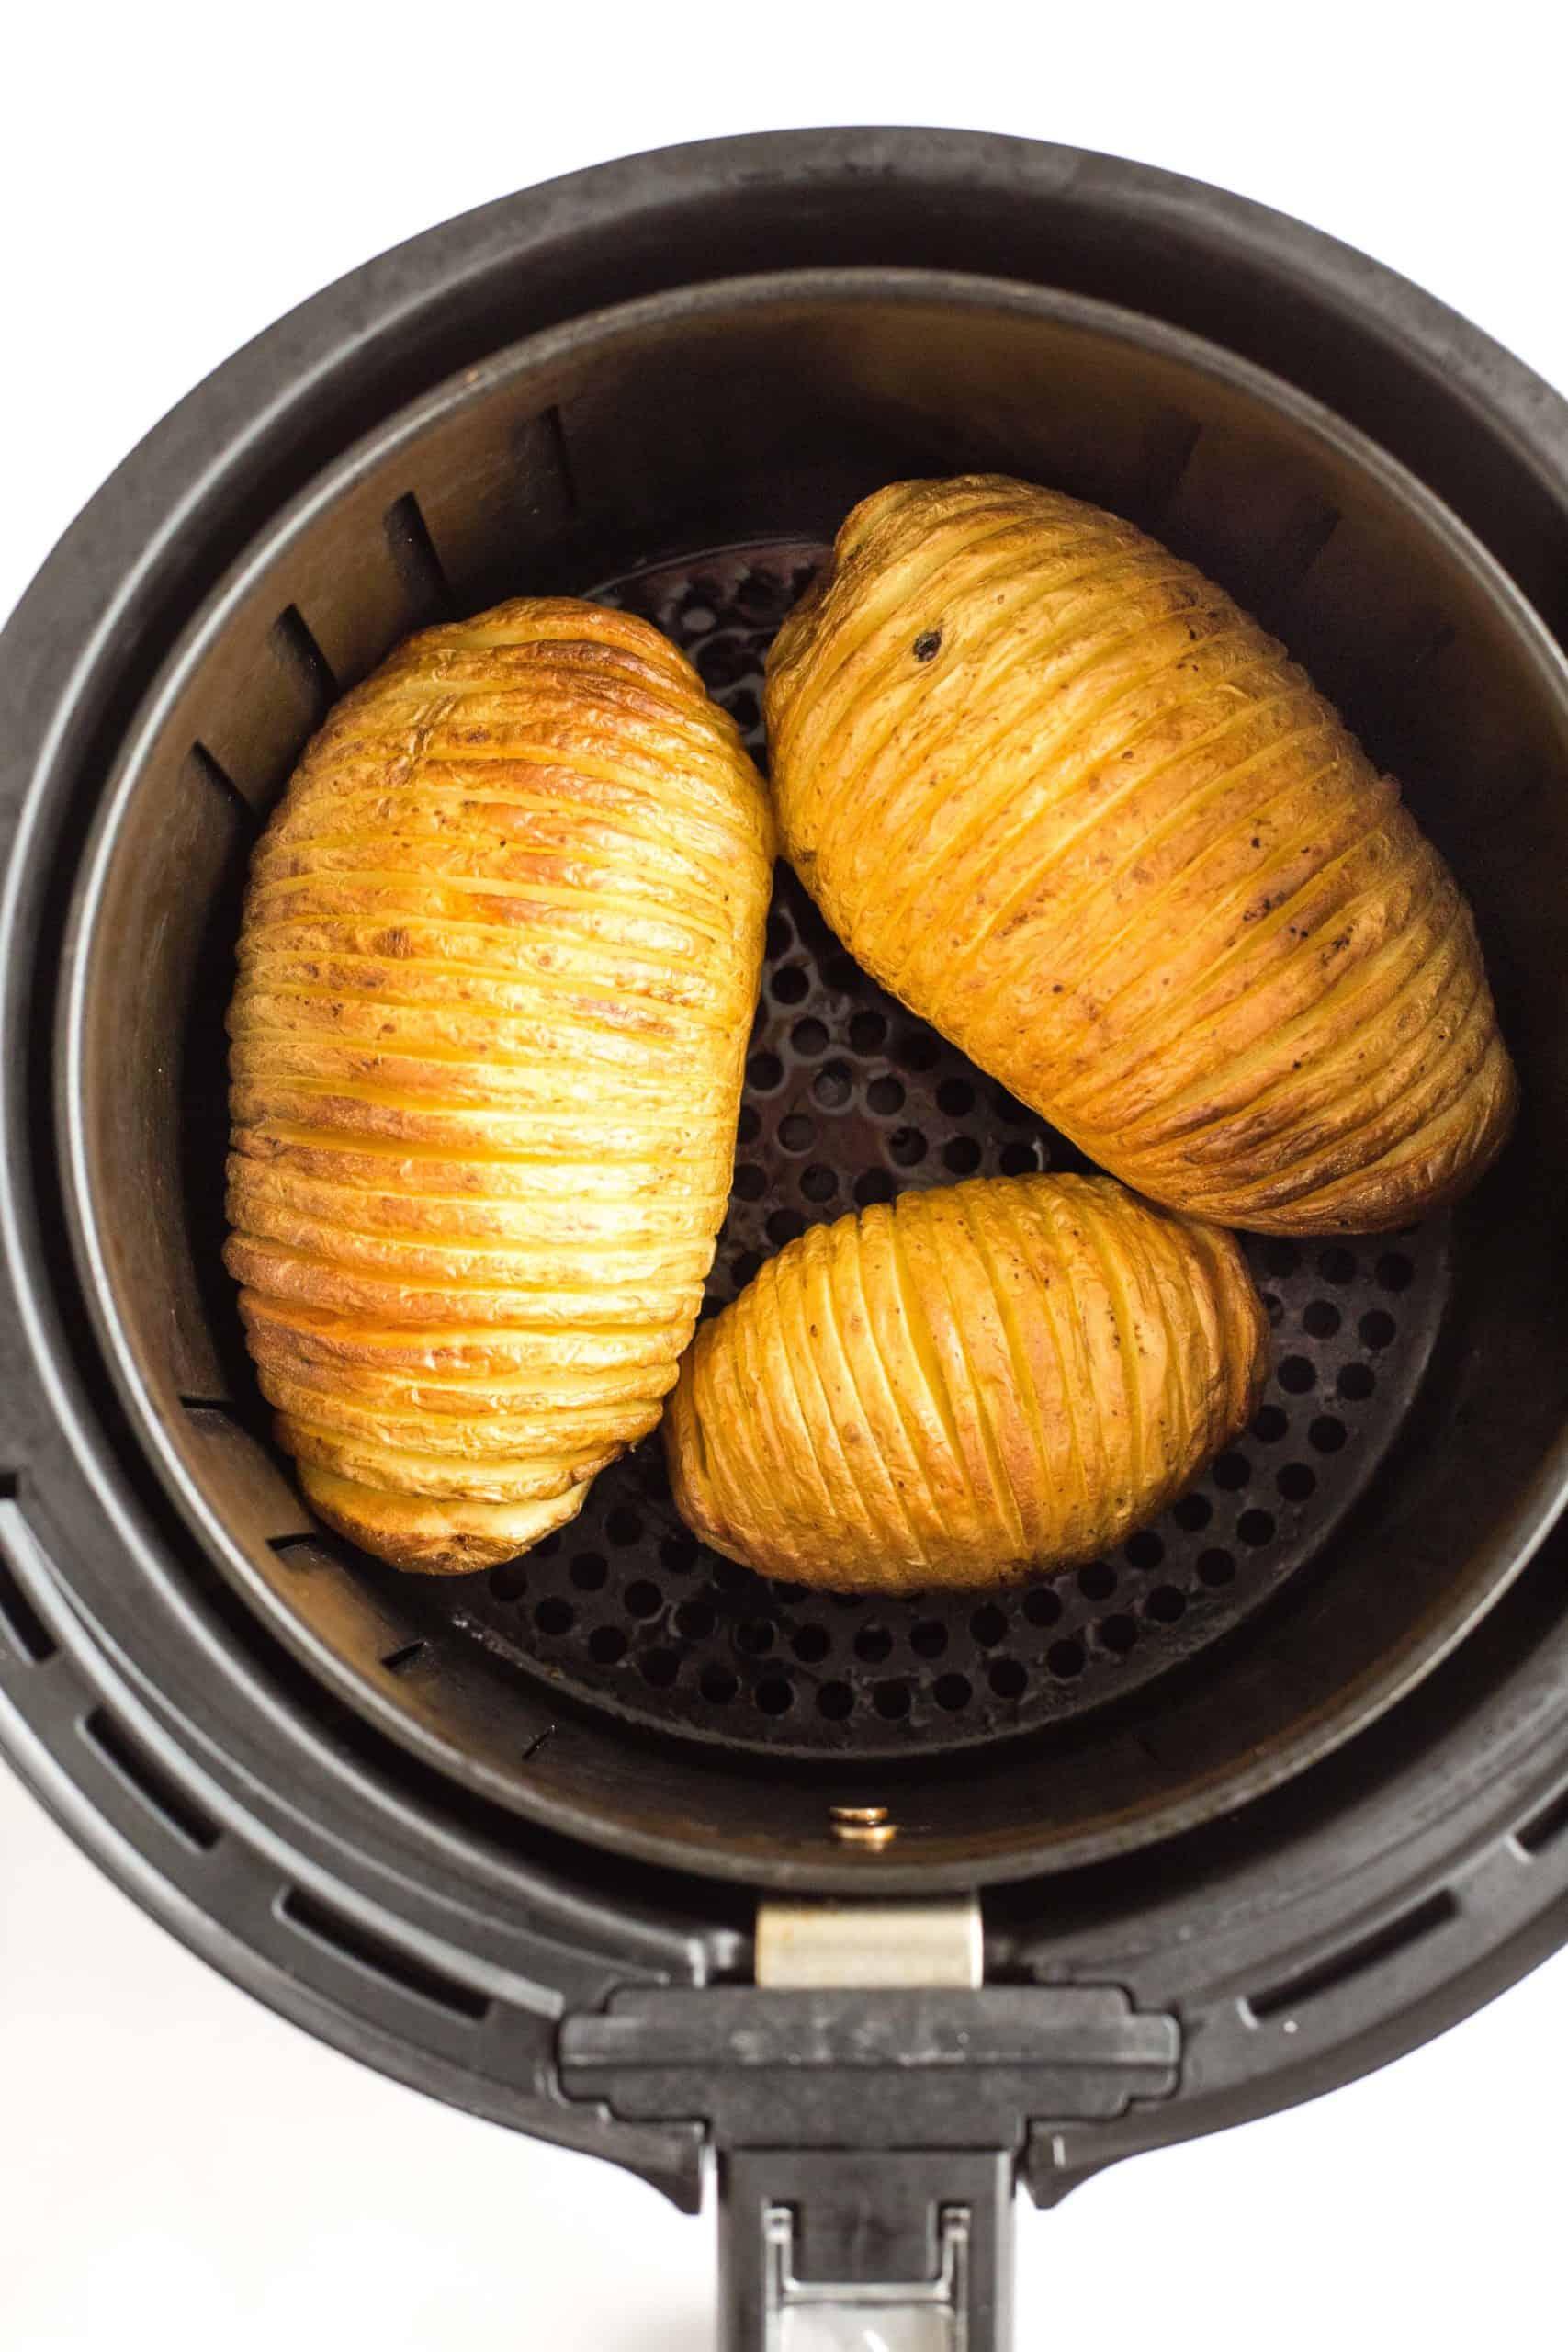 Crispy hasselback potatoes in the air fryer basket.